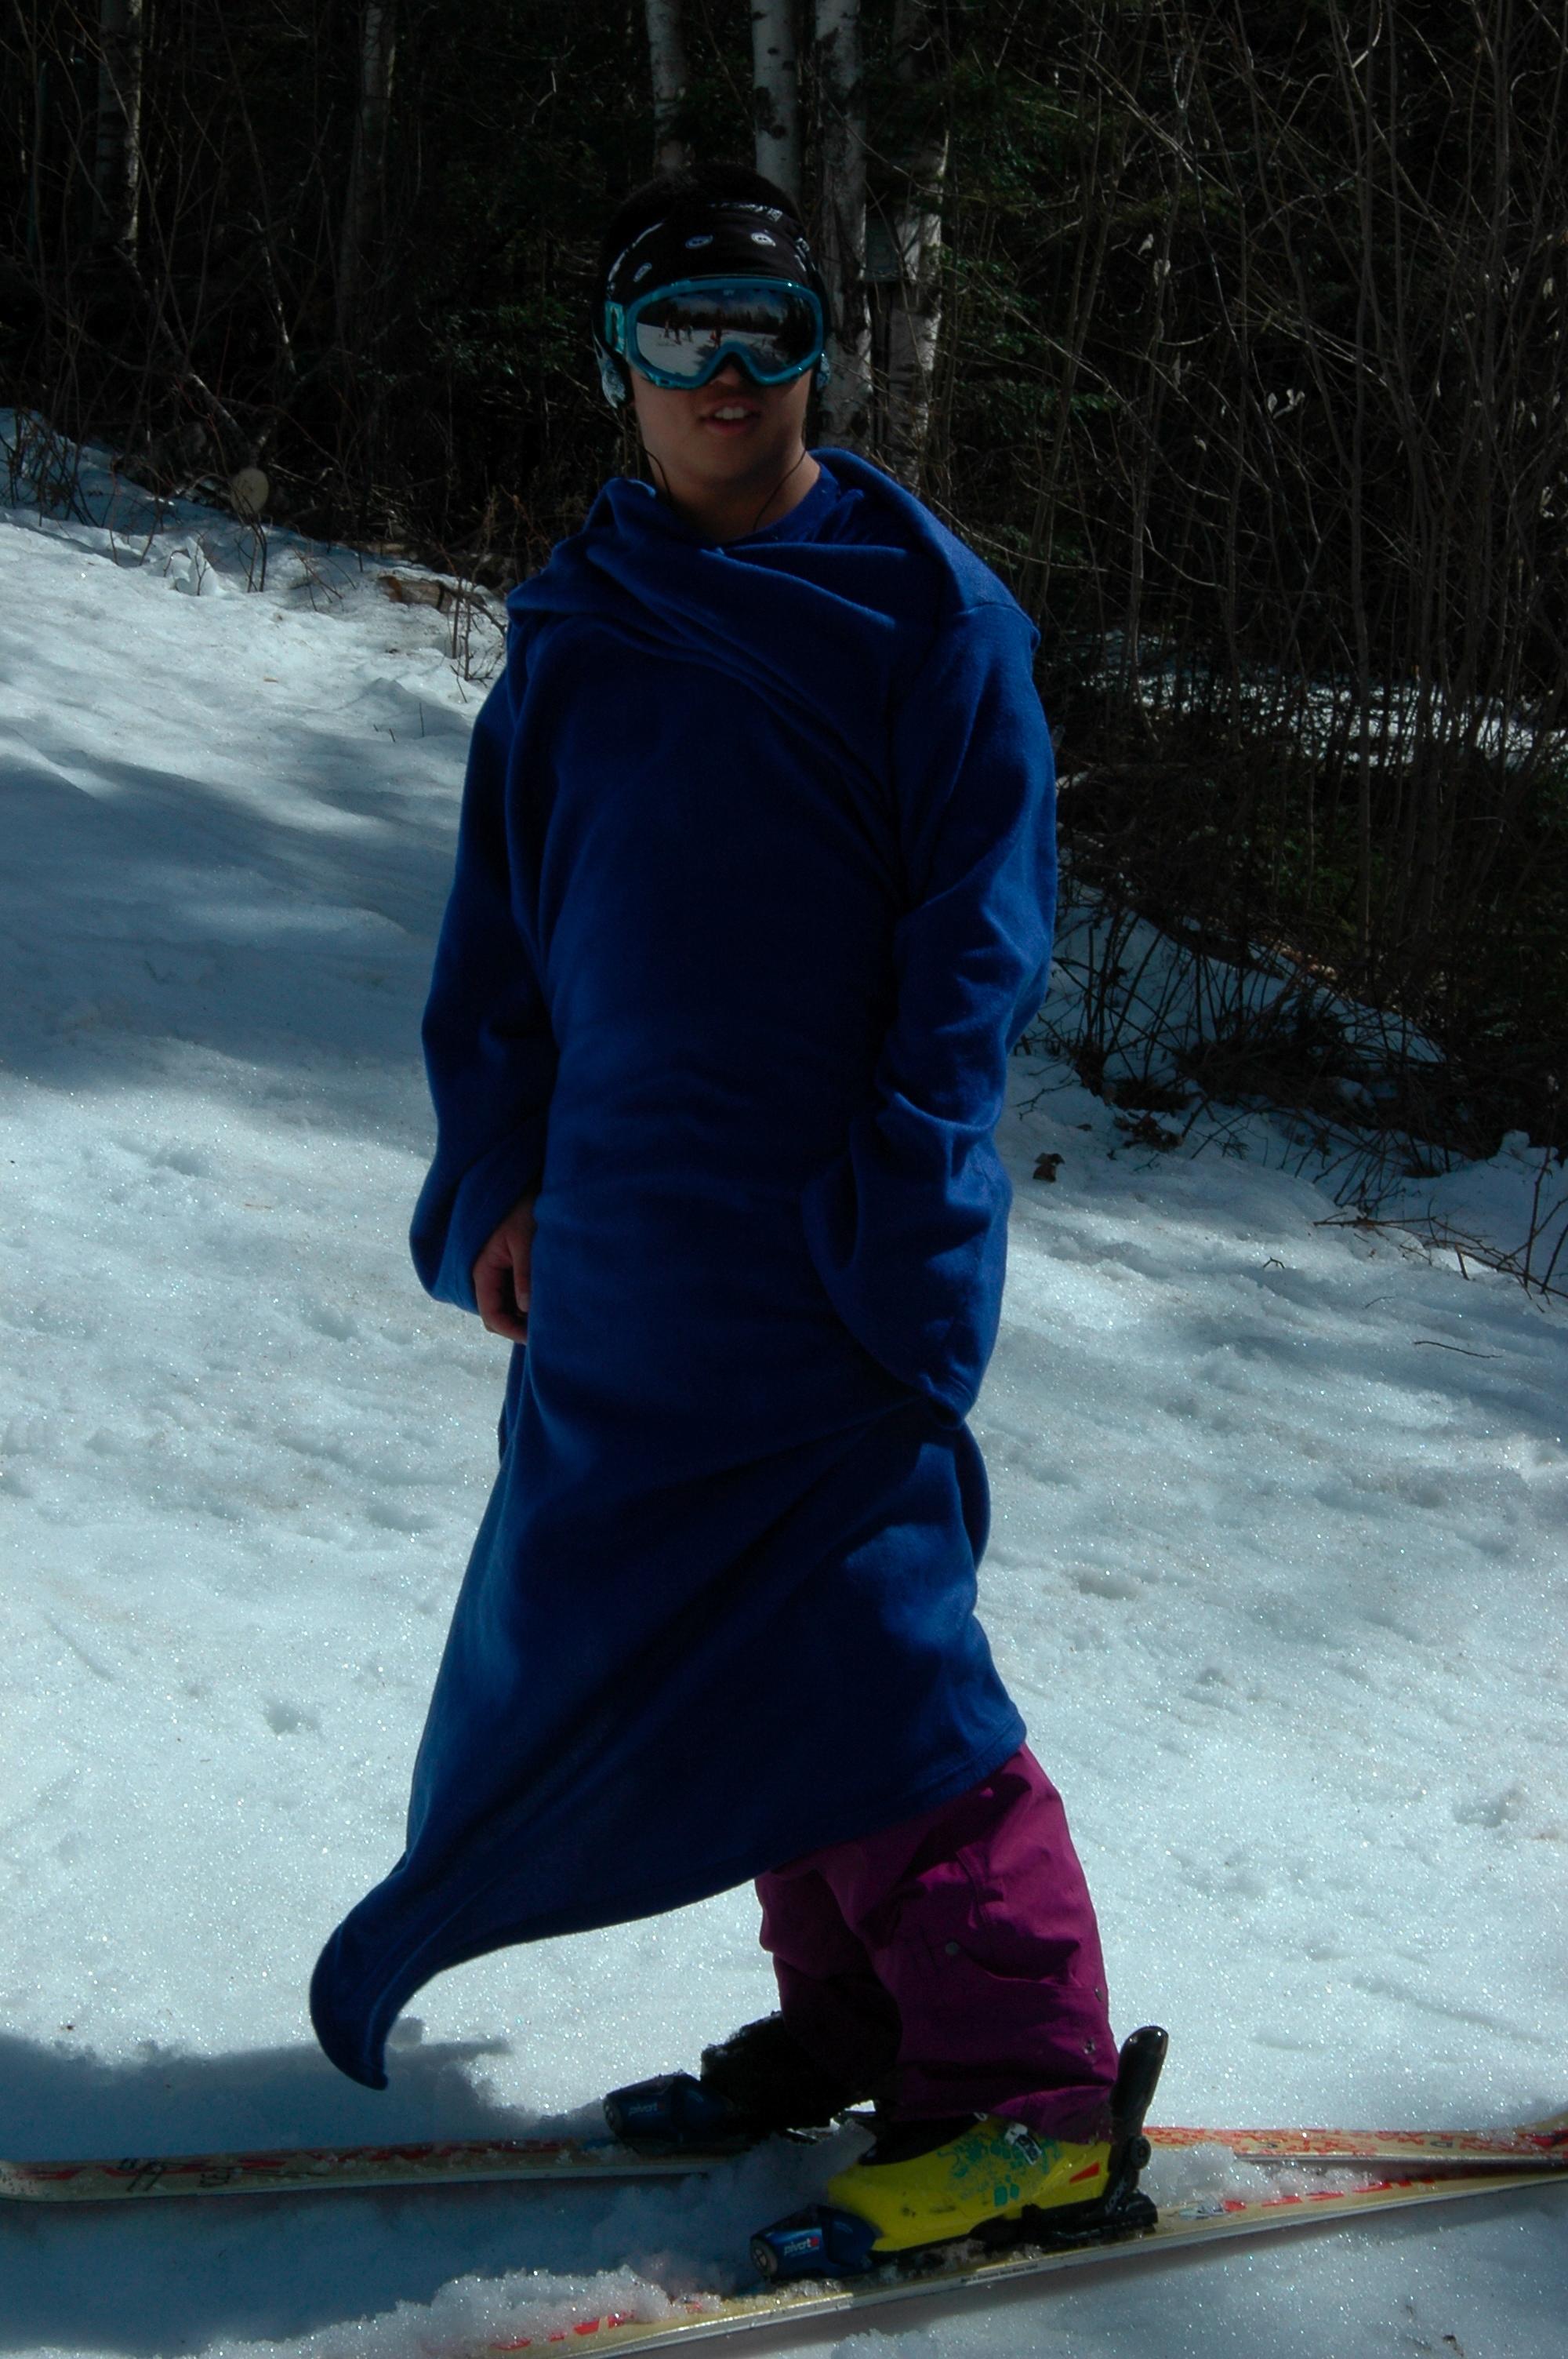 Skiing in a Snuggie